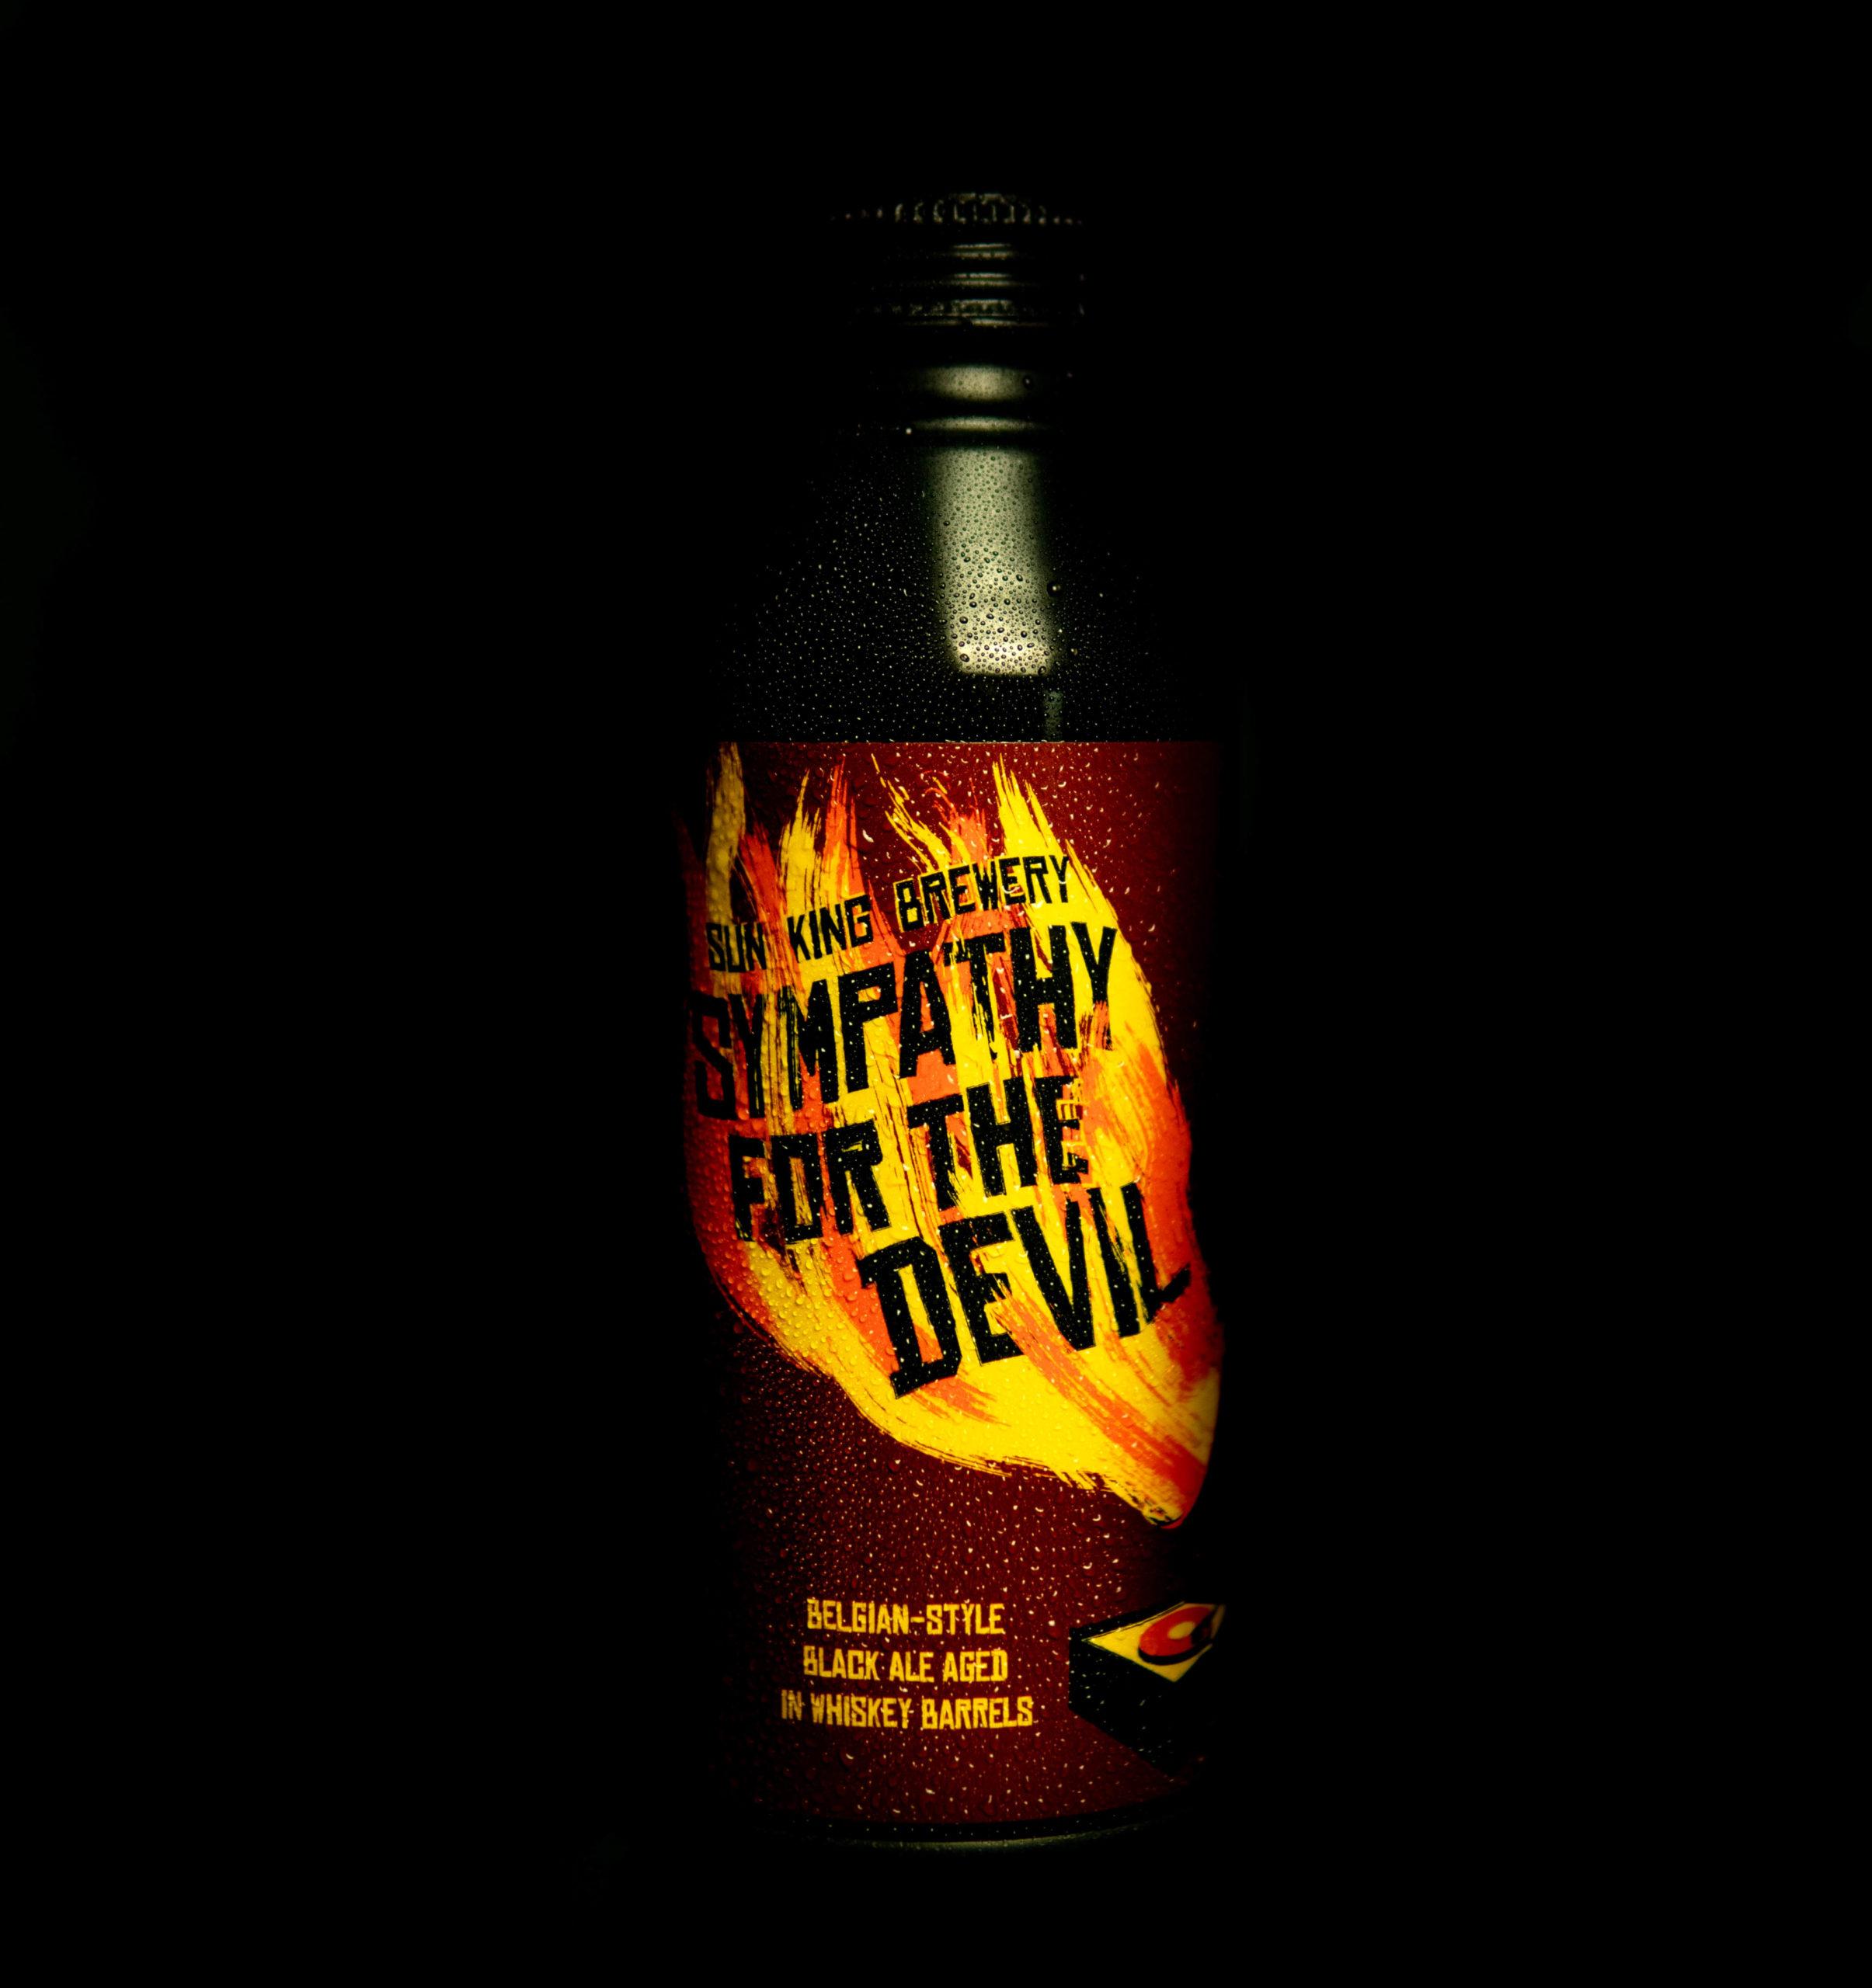 a bottle of sympathy for the devil